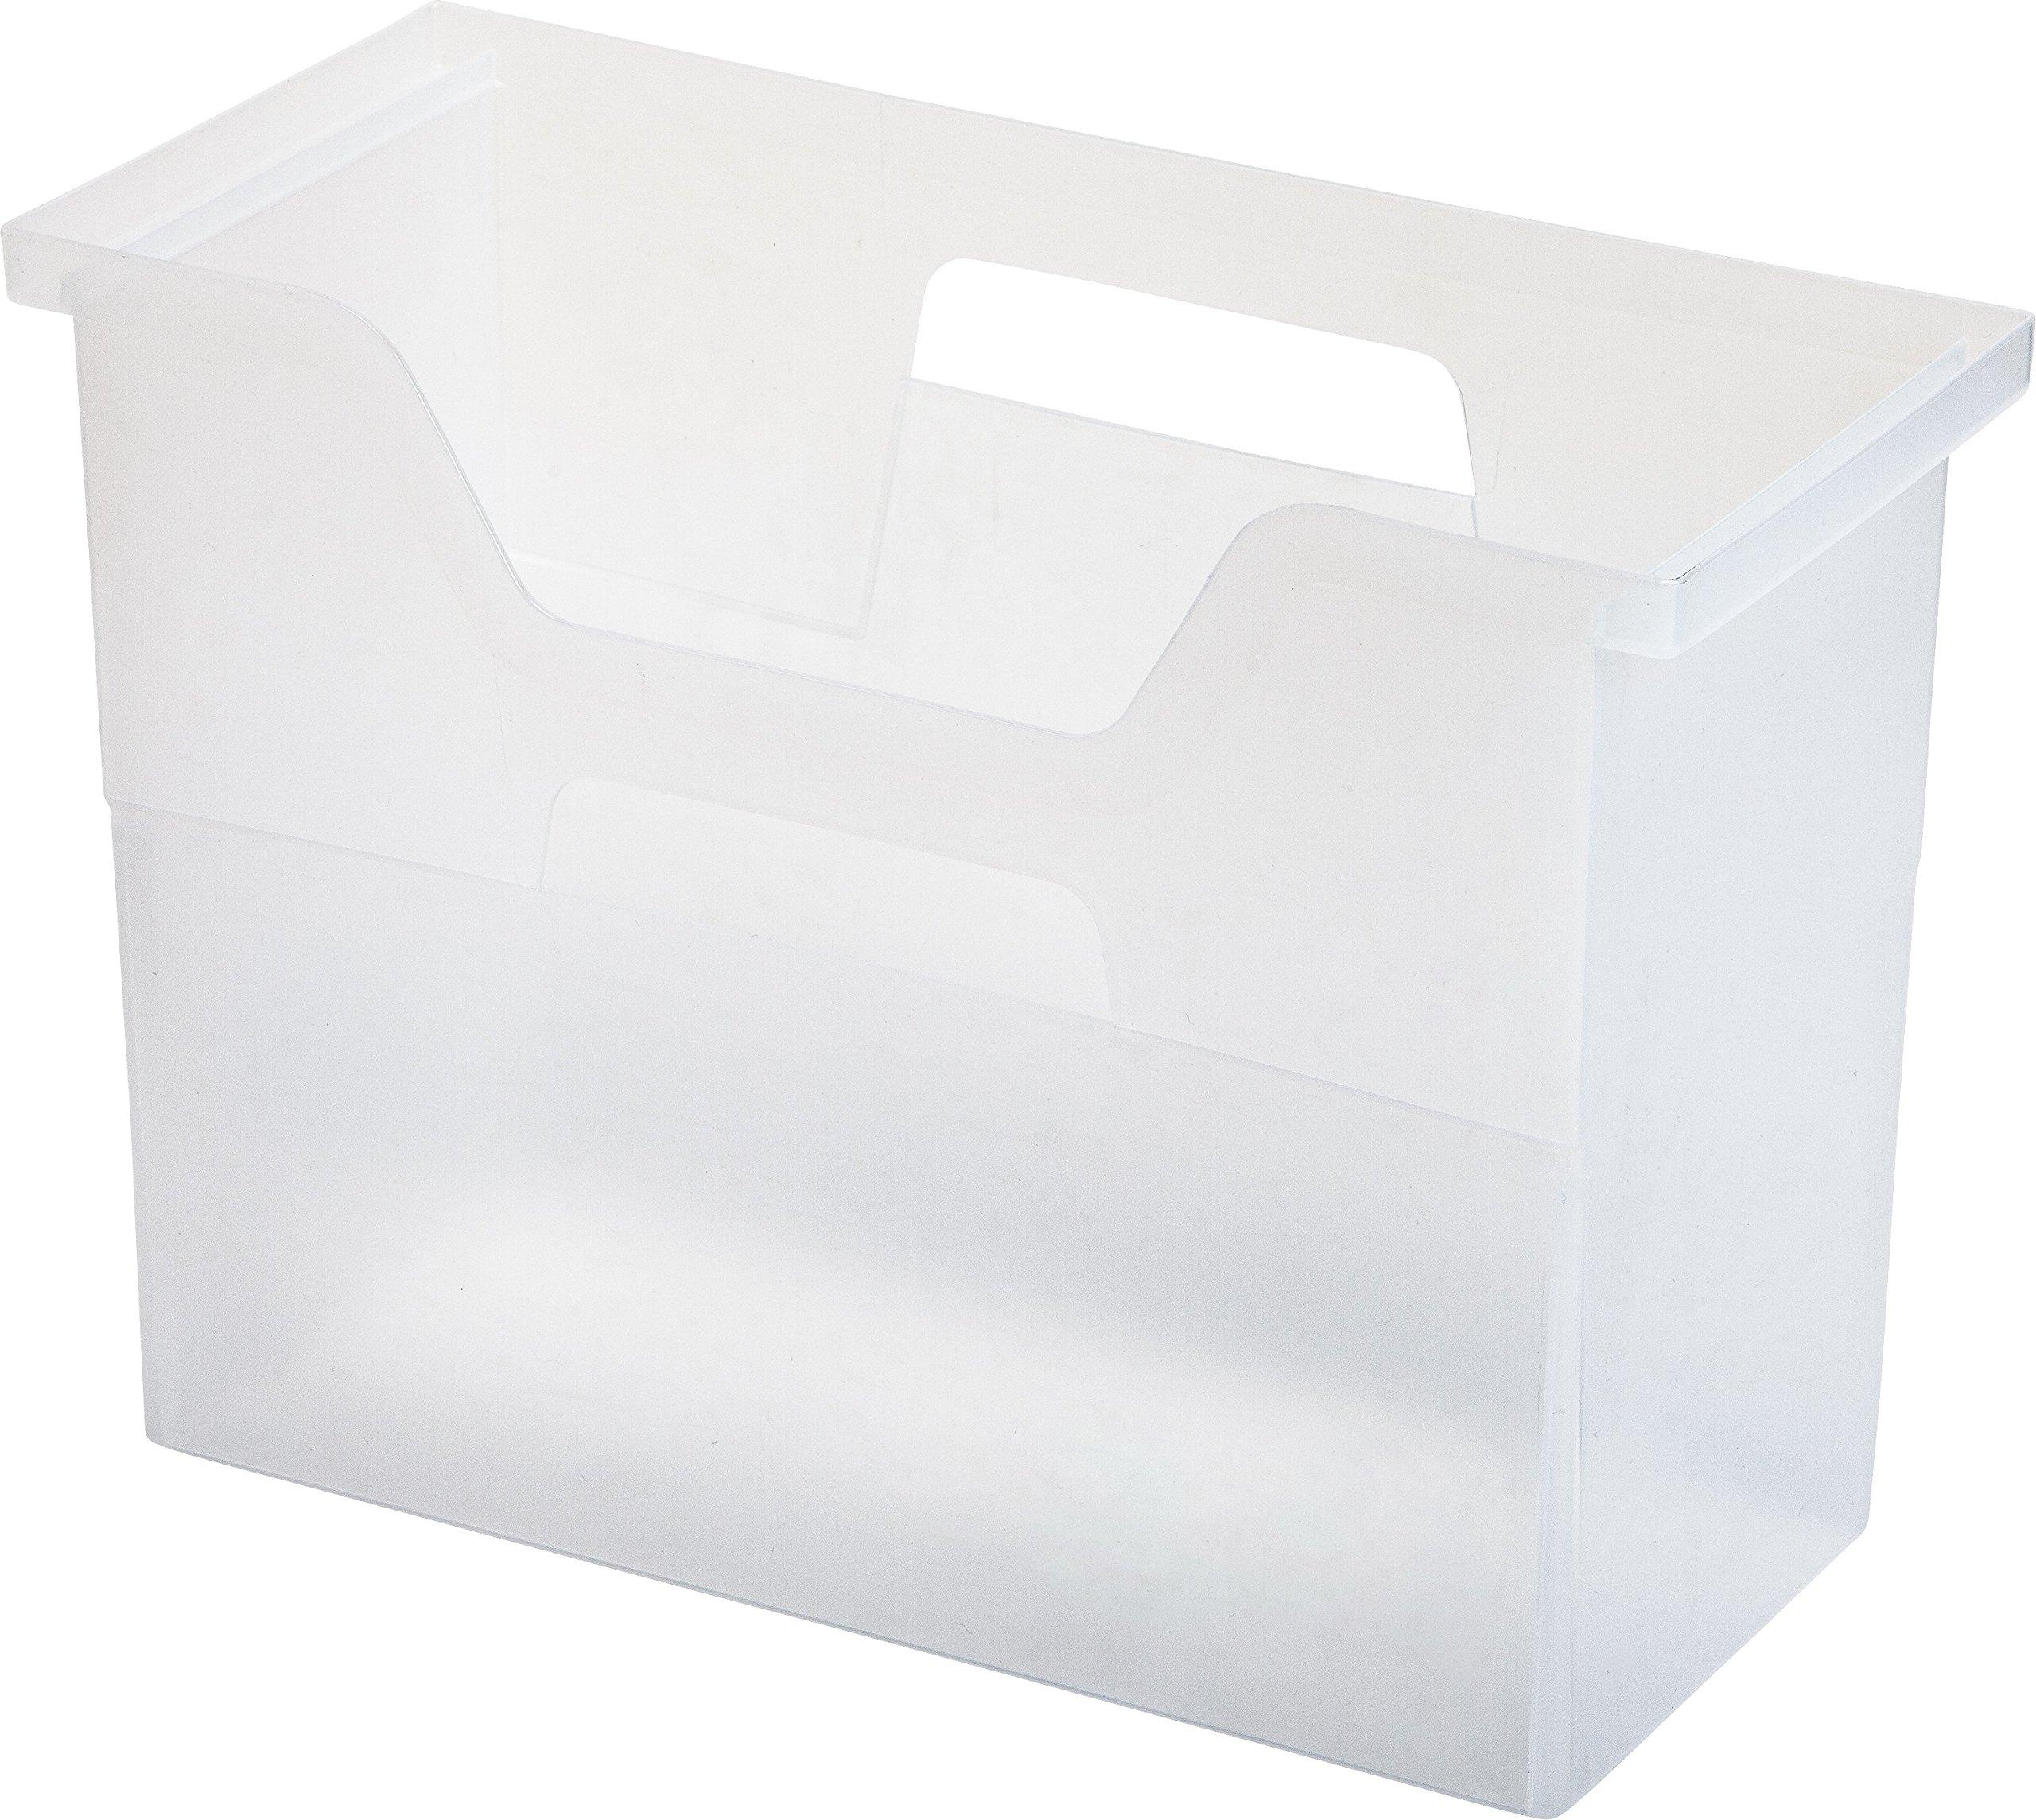 IRIS Desktop File Box, 6 Pack, Medium, Clear by IRIS USA, Inc.